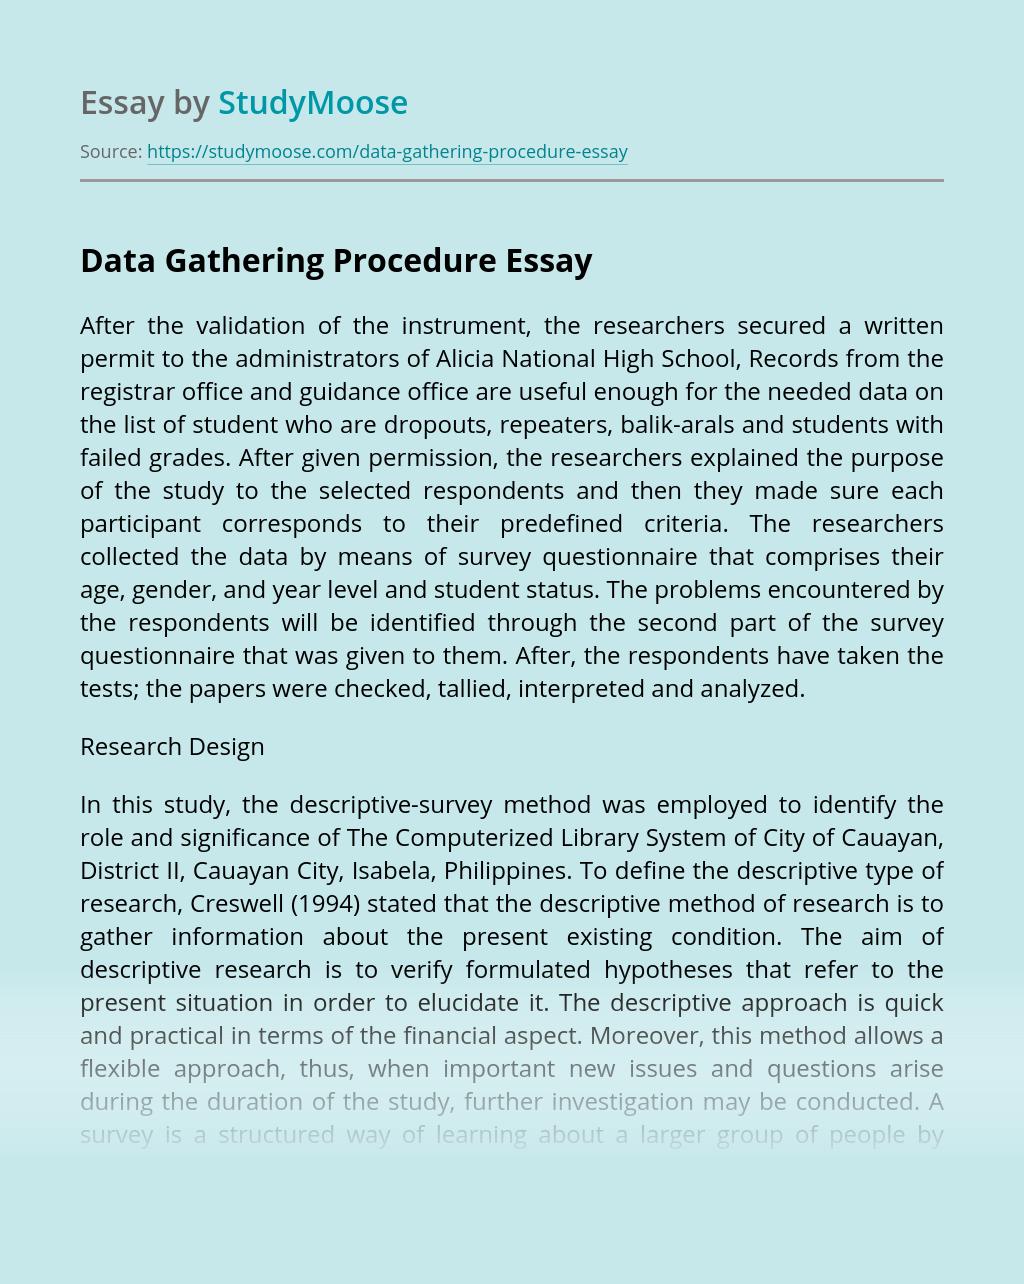 Data Gathering Procedure